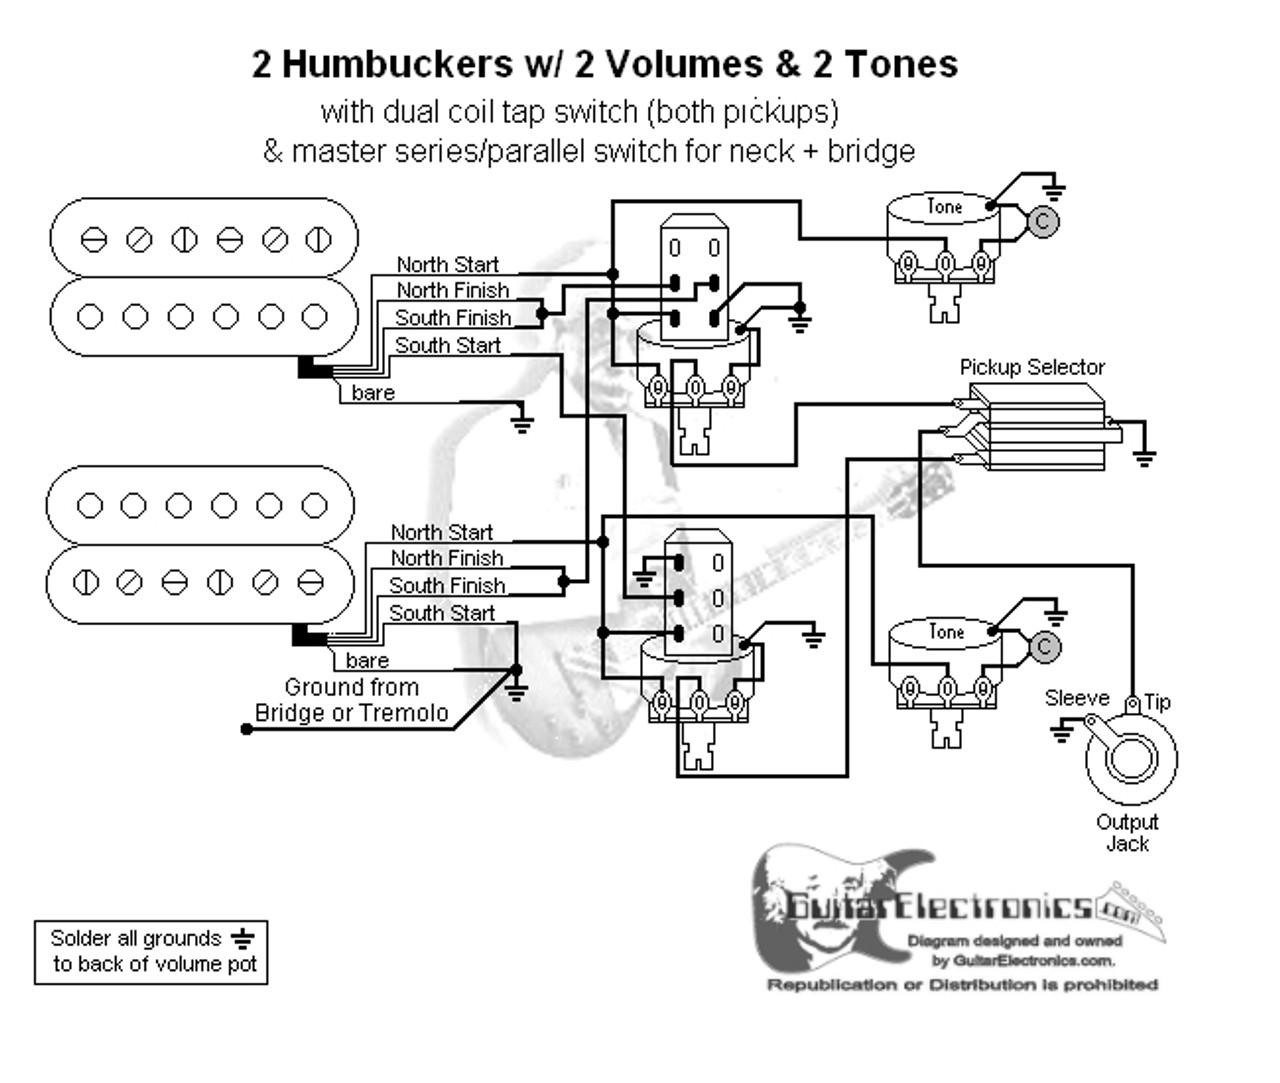 2 humbuckers 3 way toggle switch 2 volumes 2 tones coil tap u0026 series parallel3 [ 1280 x 1083 Pixel ]